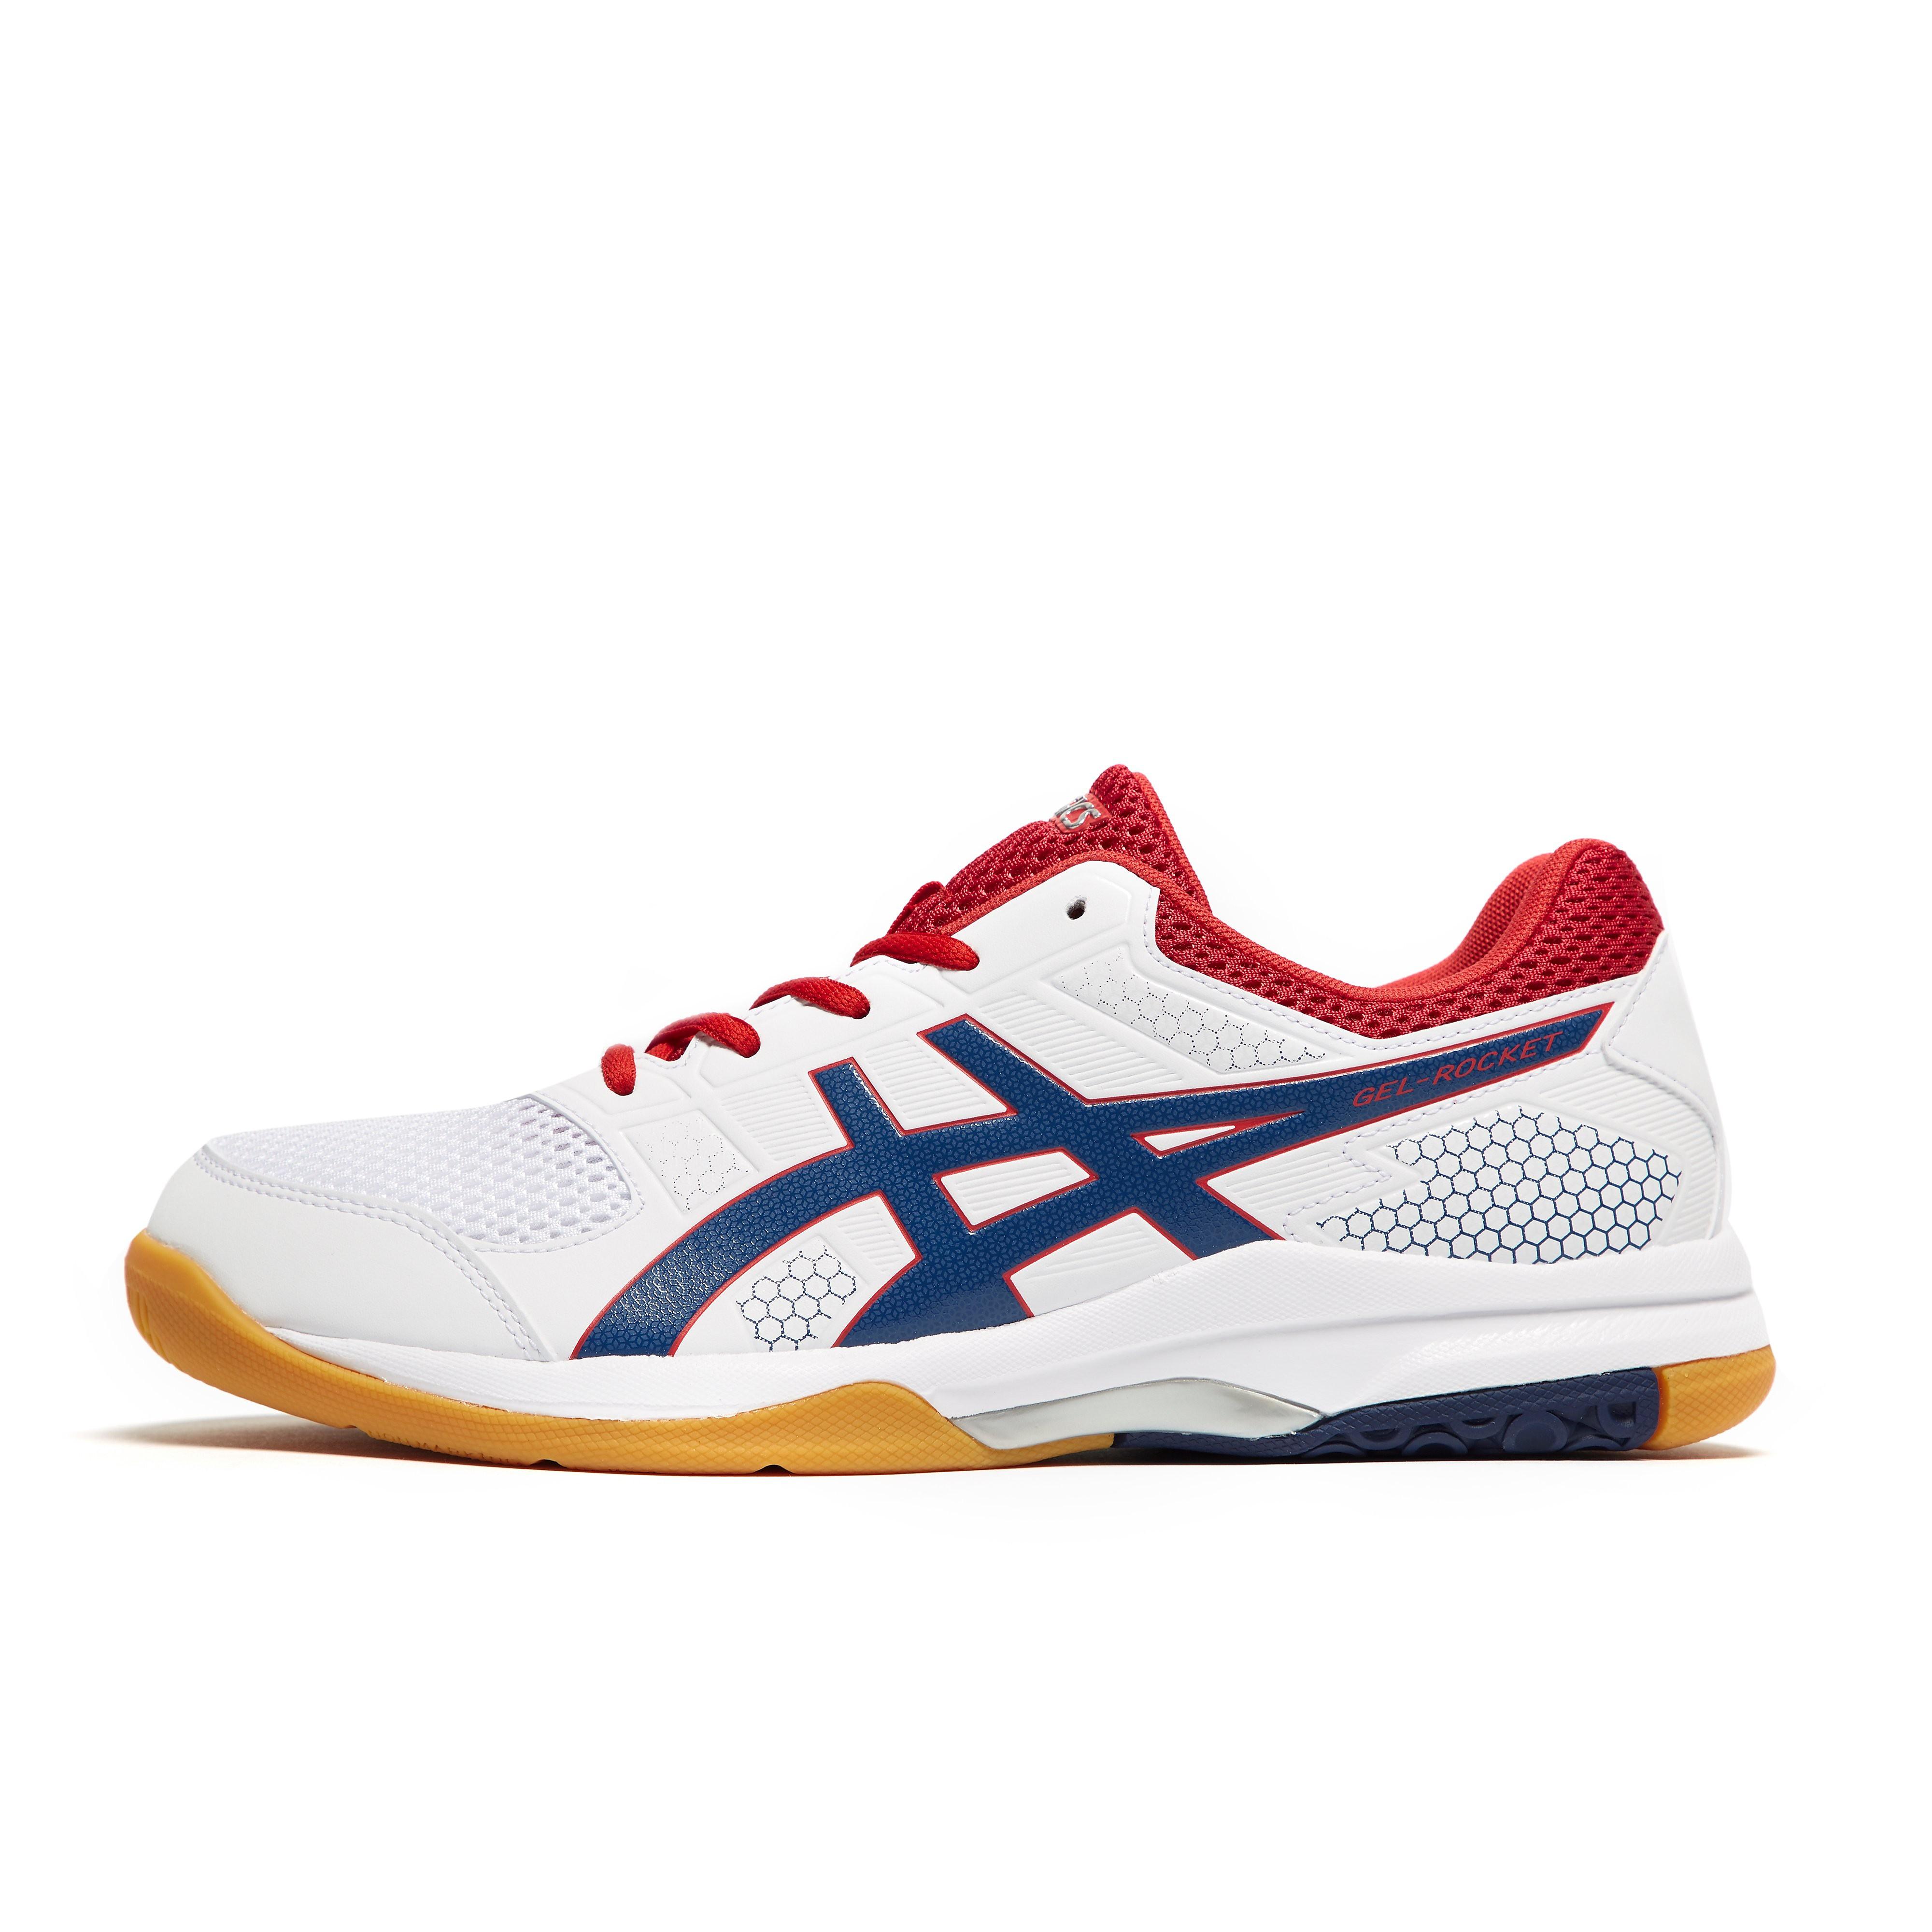 Mens White ASICS GEL-Rocket 8 Court Shoes, White